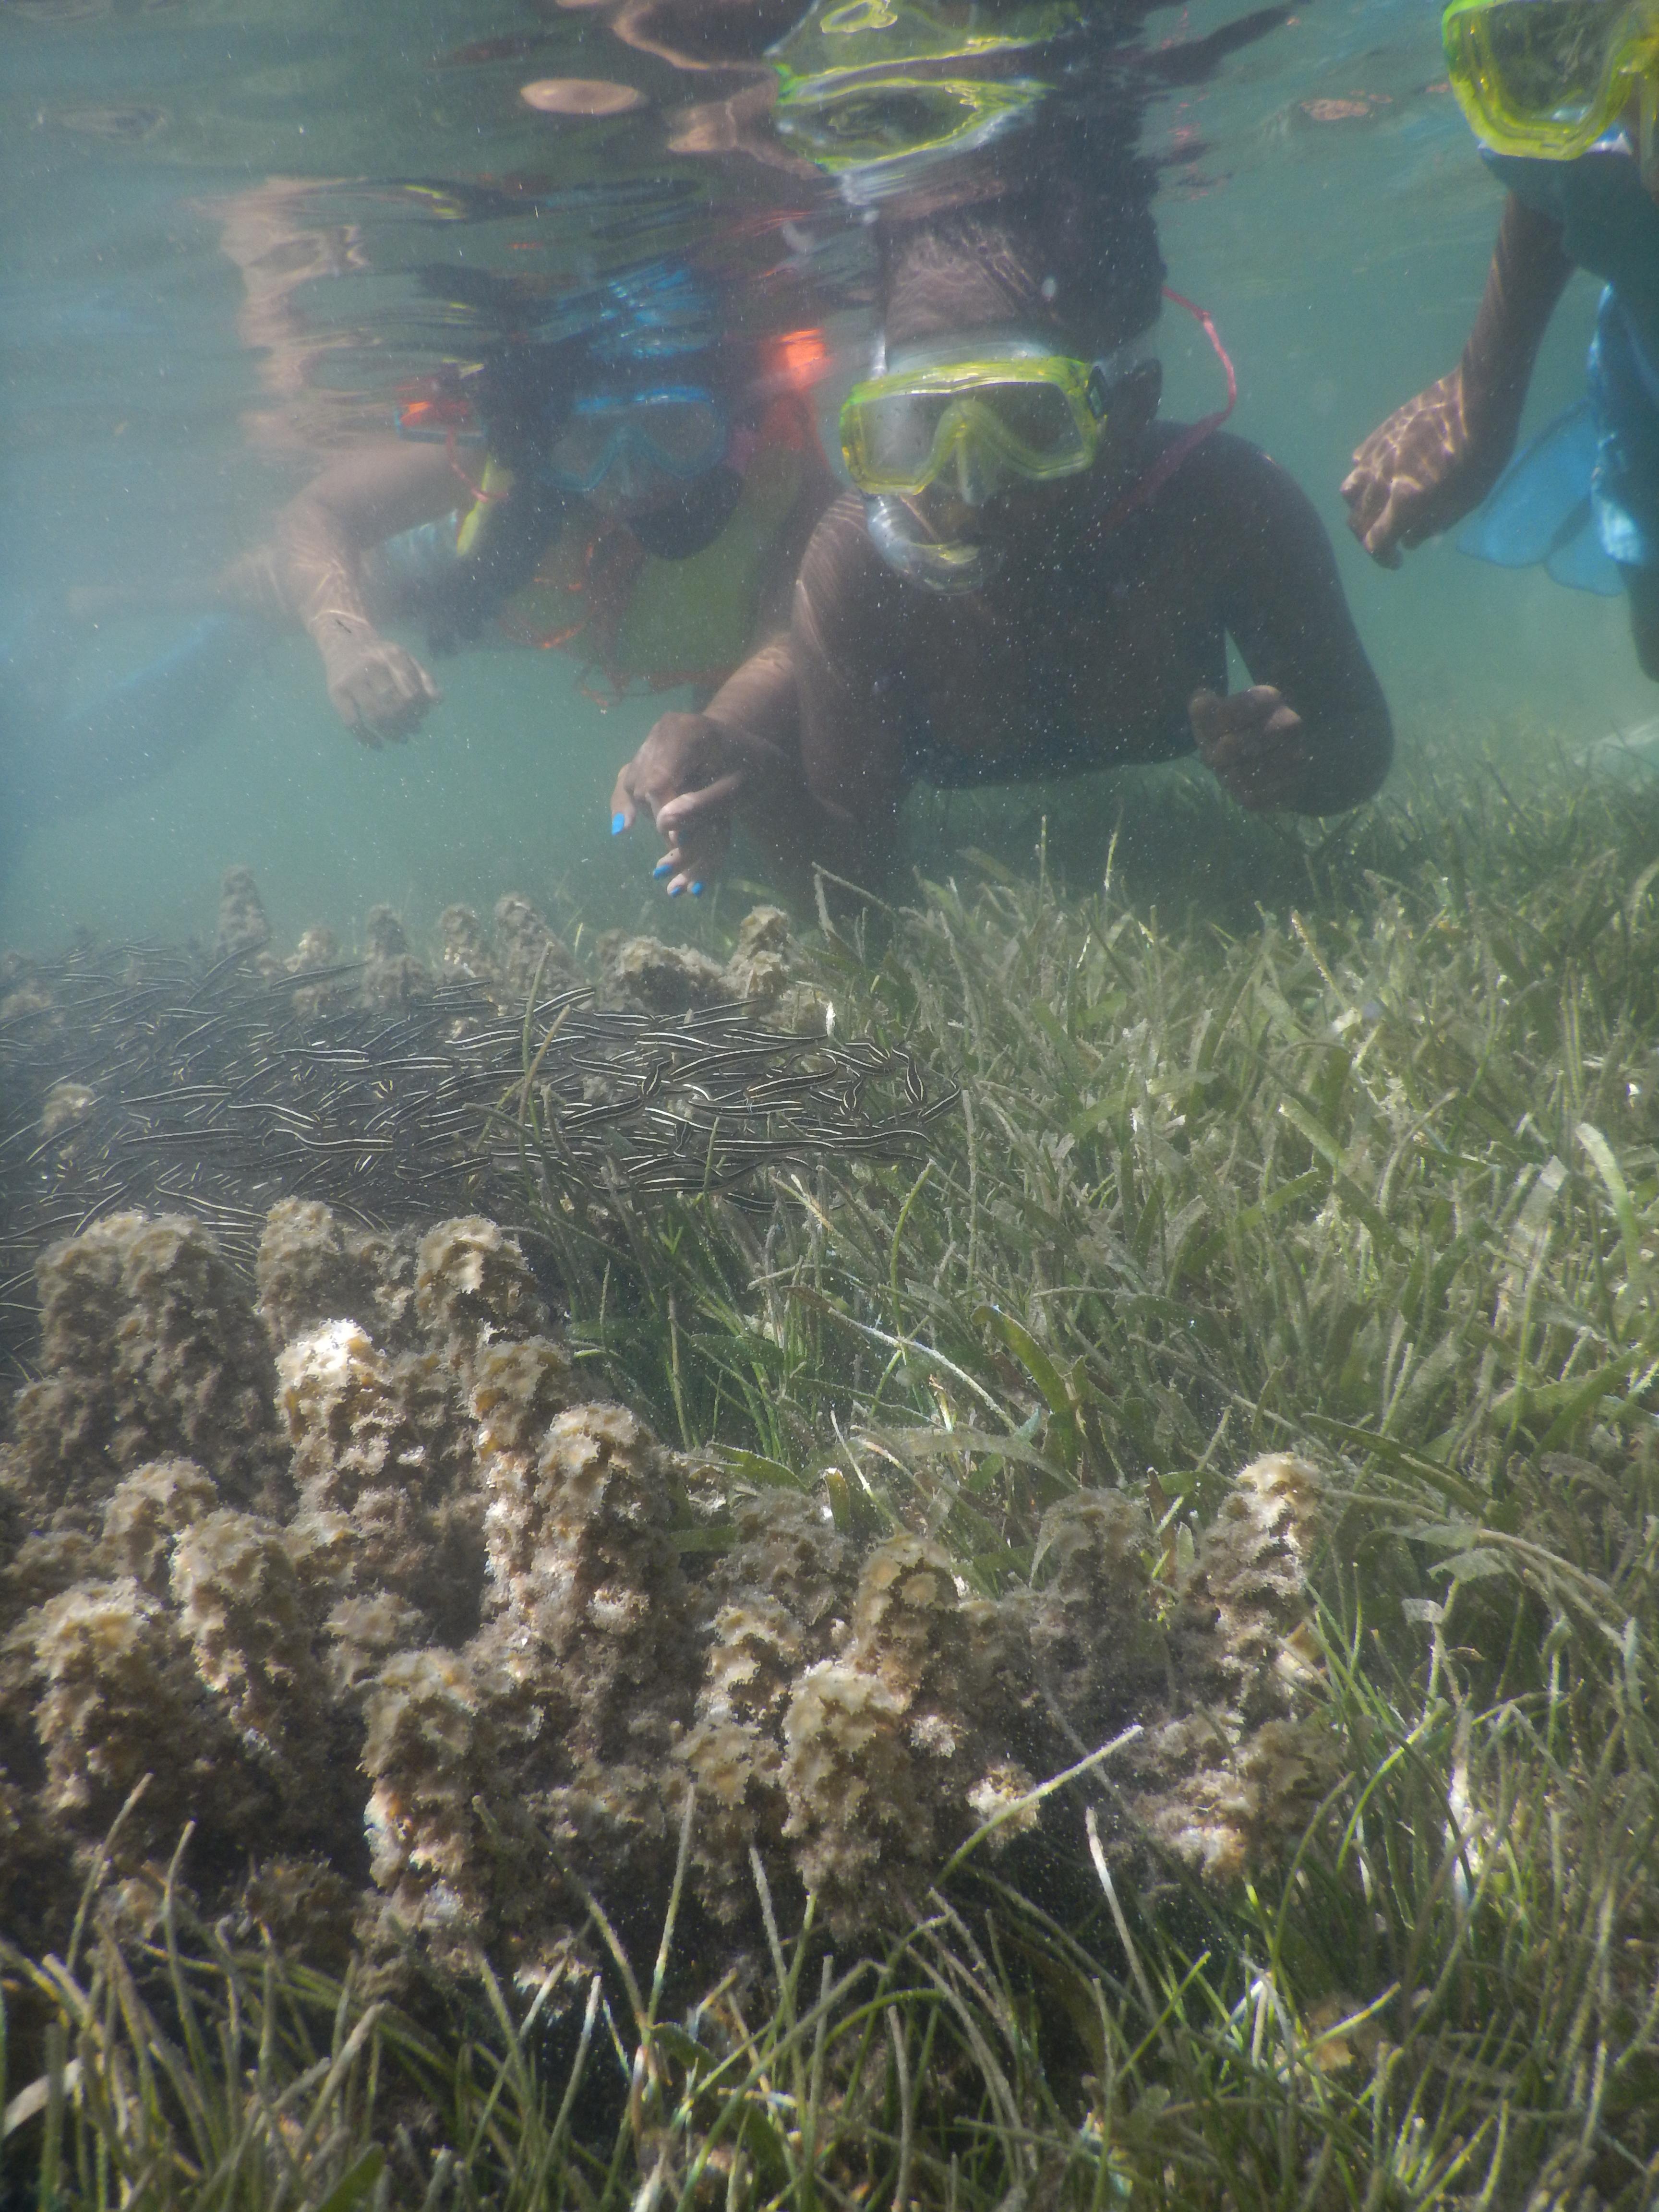 MARCH abi - motivated marine explorers Peninnah